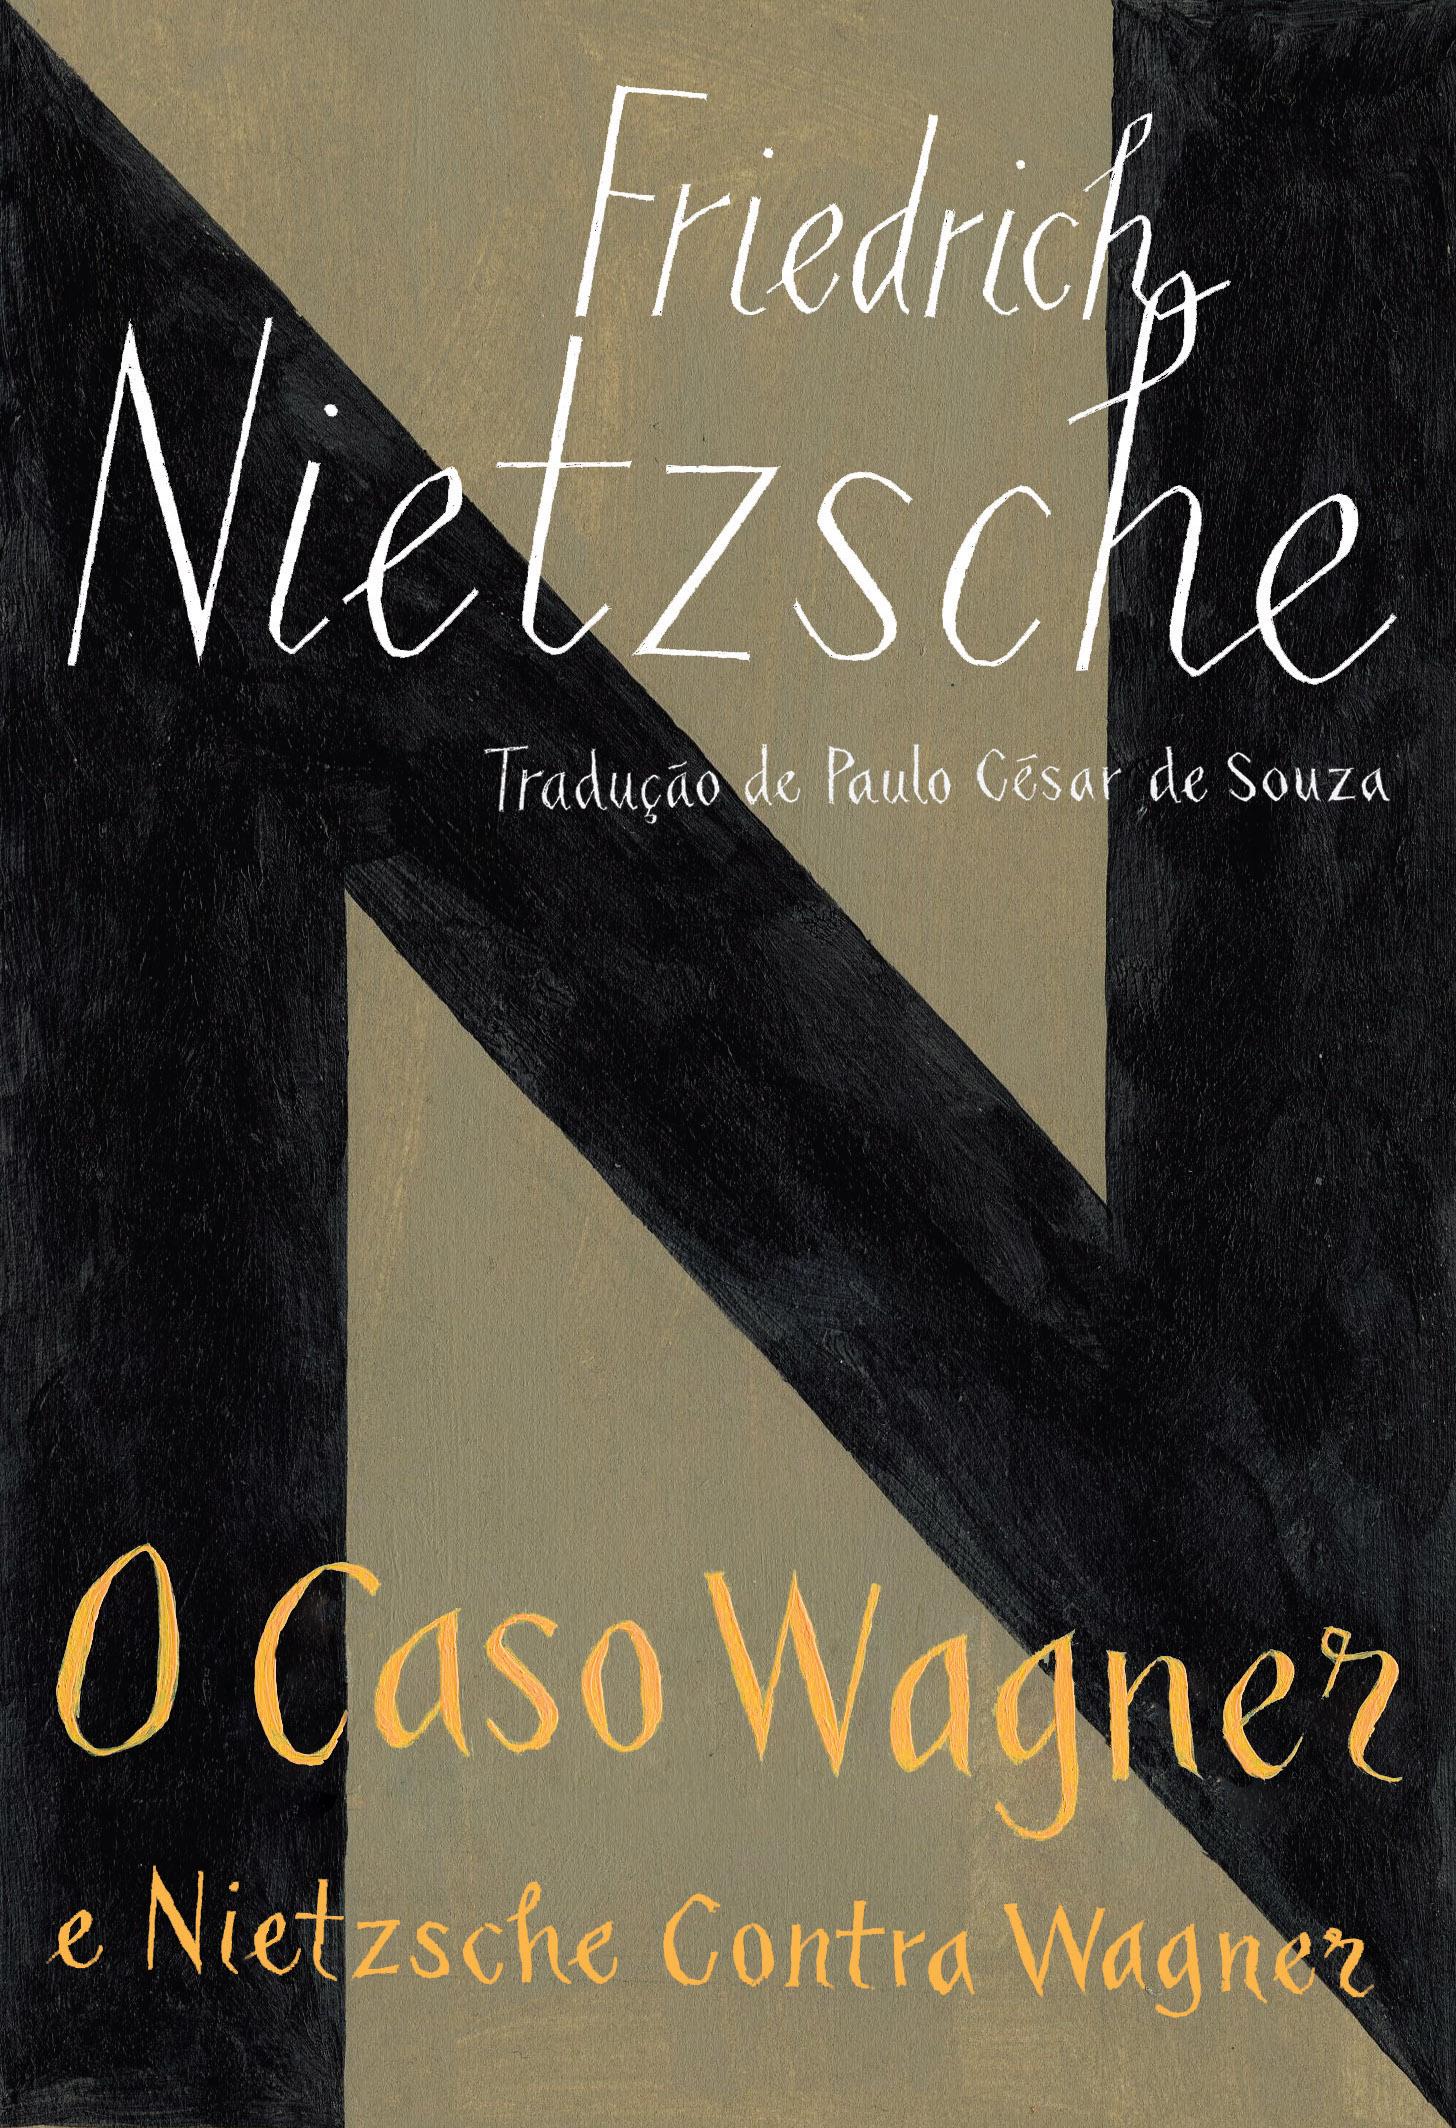 CASO WAGNER E NIETZSCHE CONTRA WAGNER, O